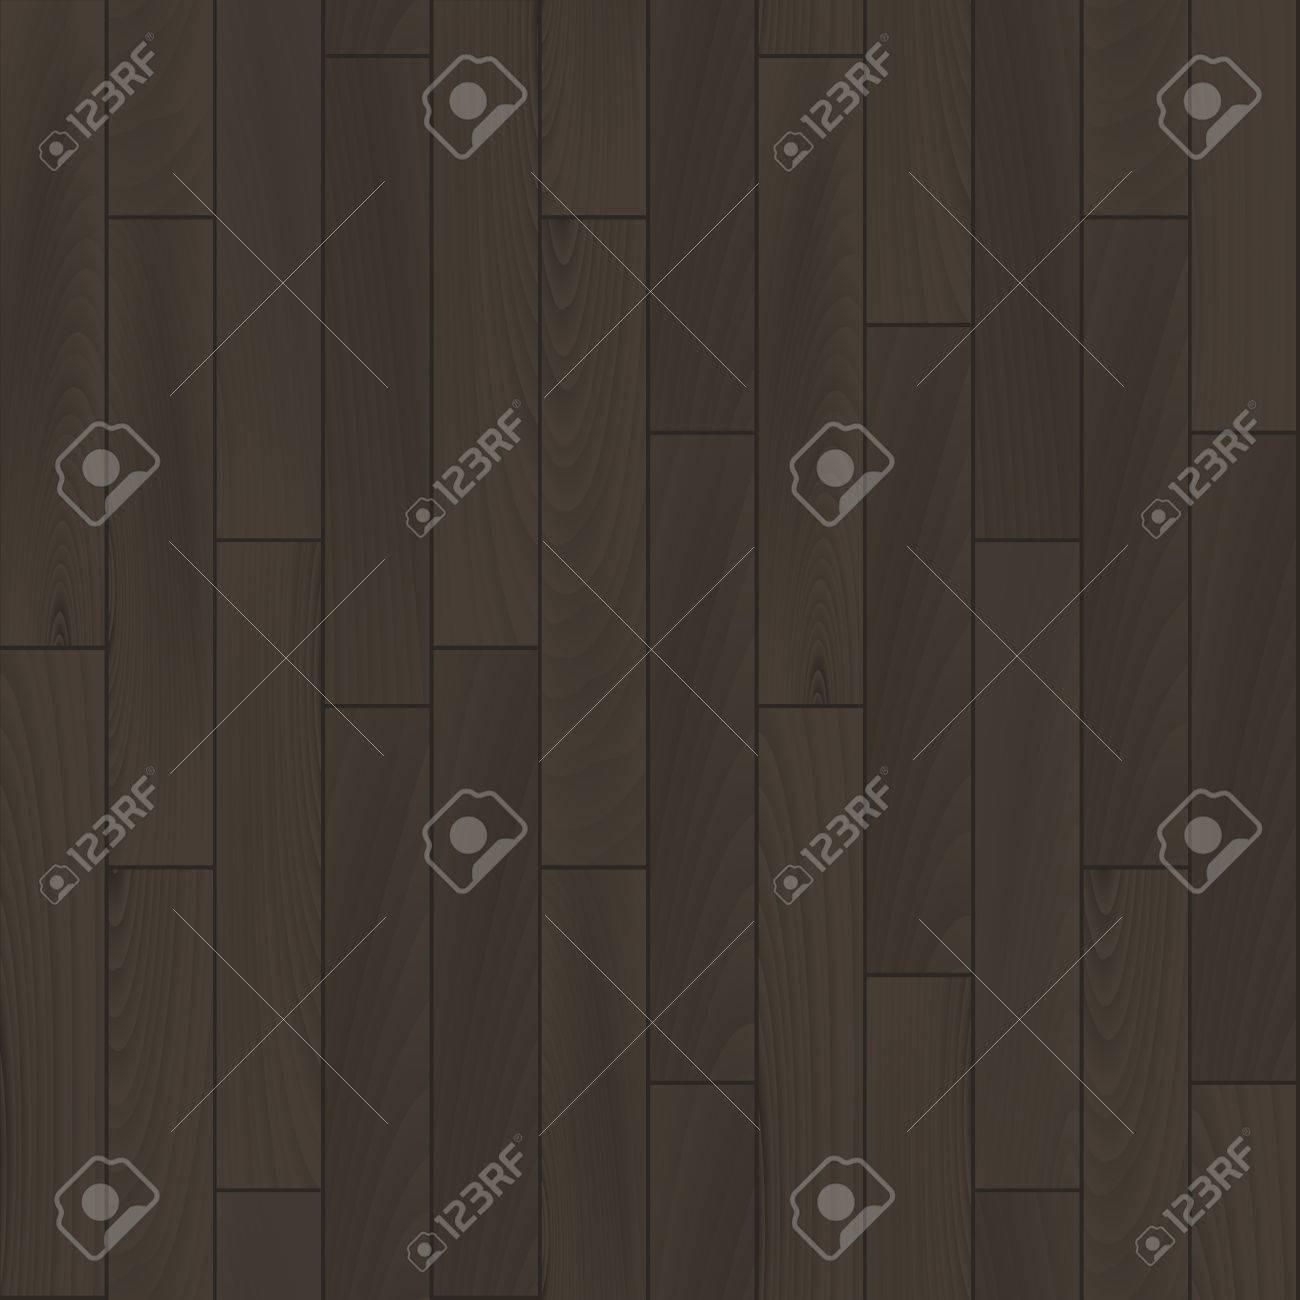 dark hardwood floor pattern. Realistic Dark Grey Wooden Floor Seamless Pattern, Vector Stock - 21583526 Hardwood Pattern